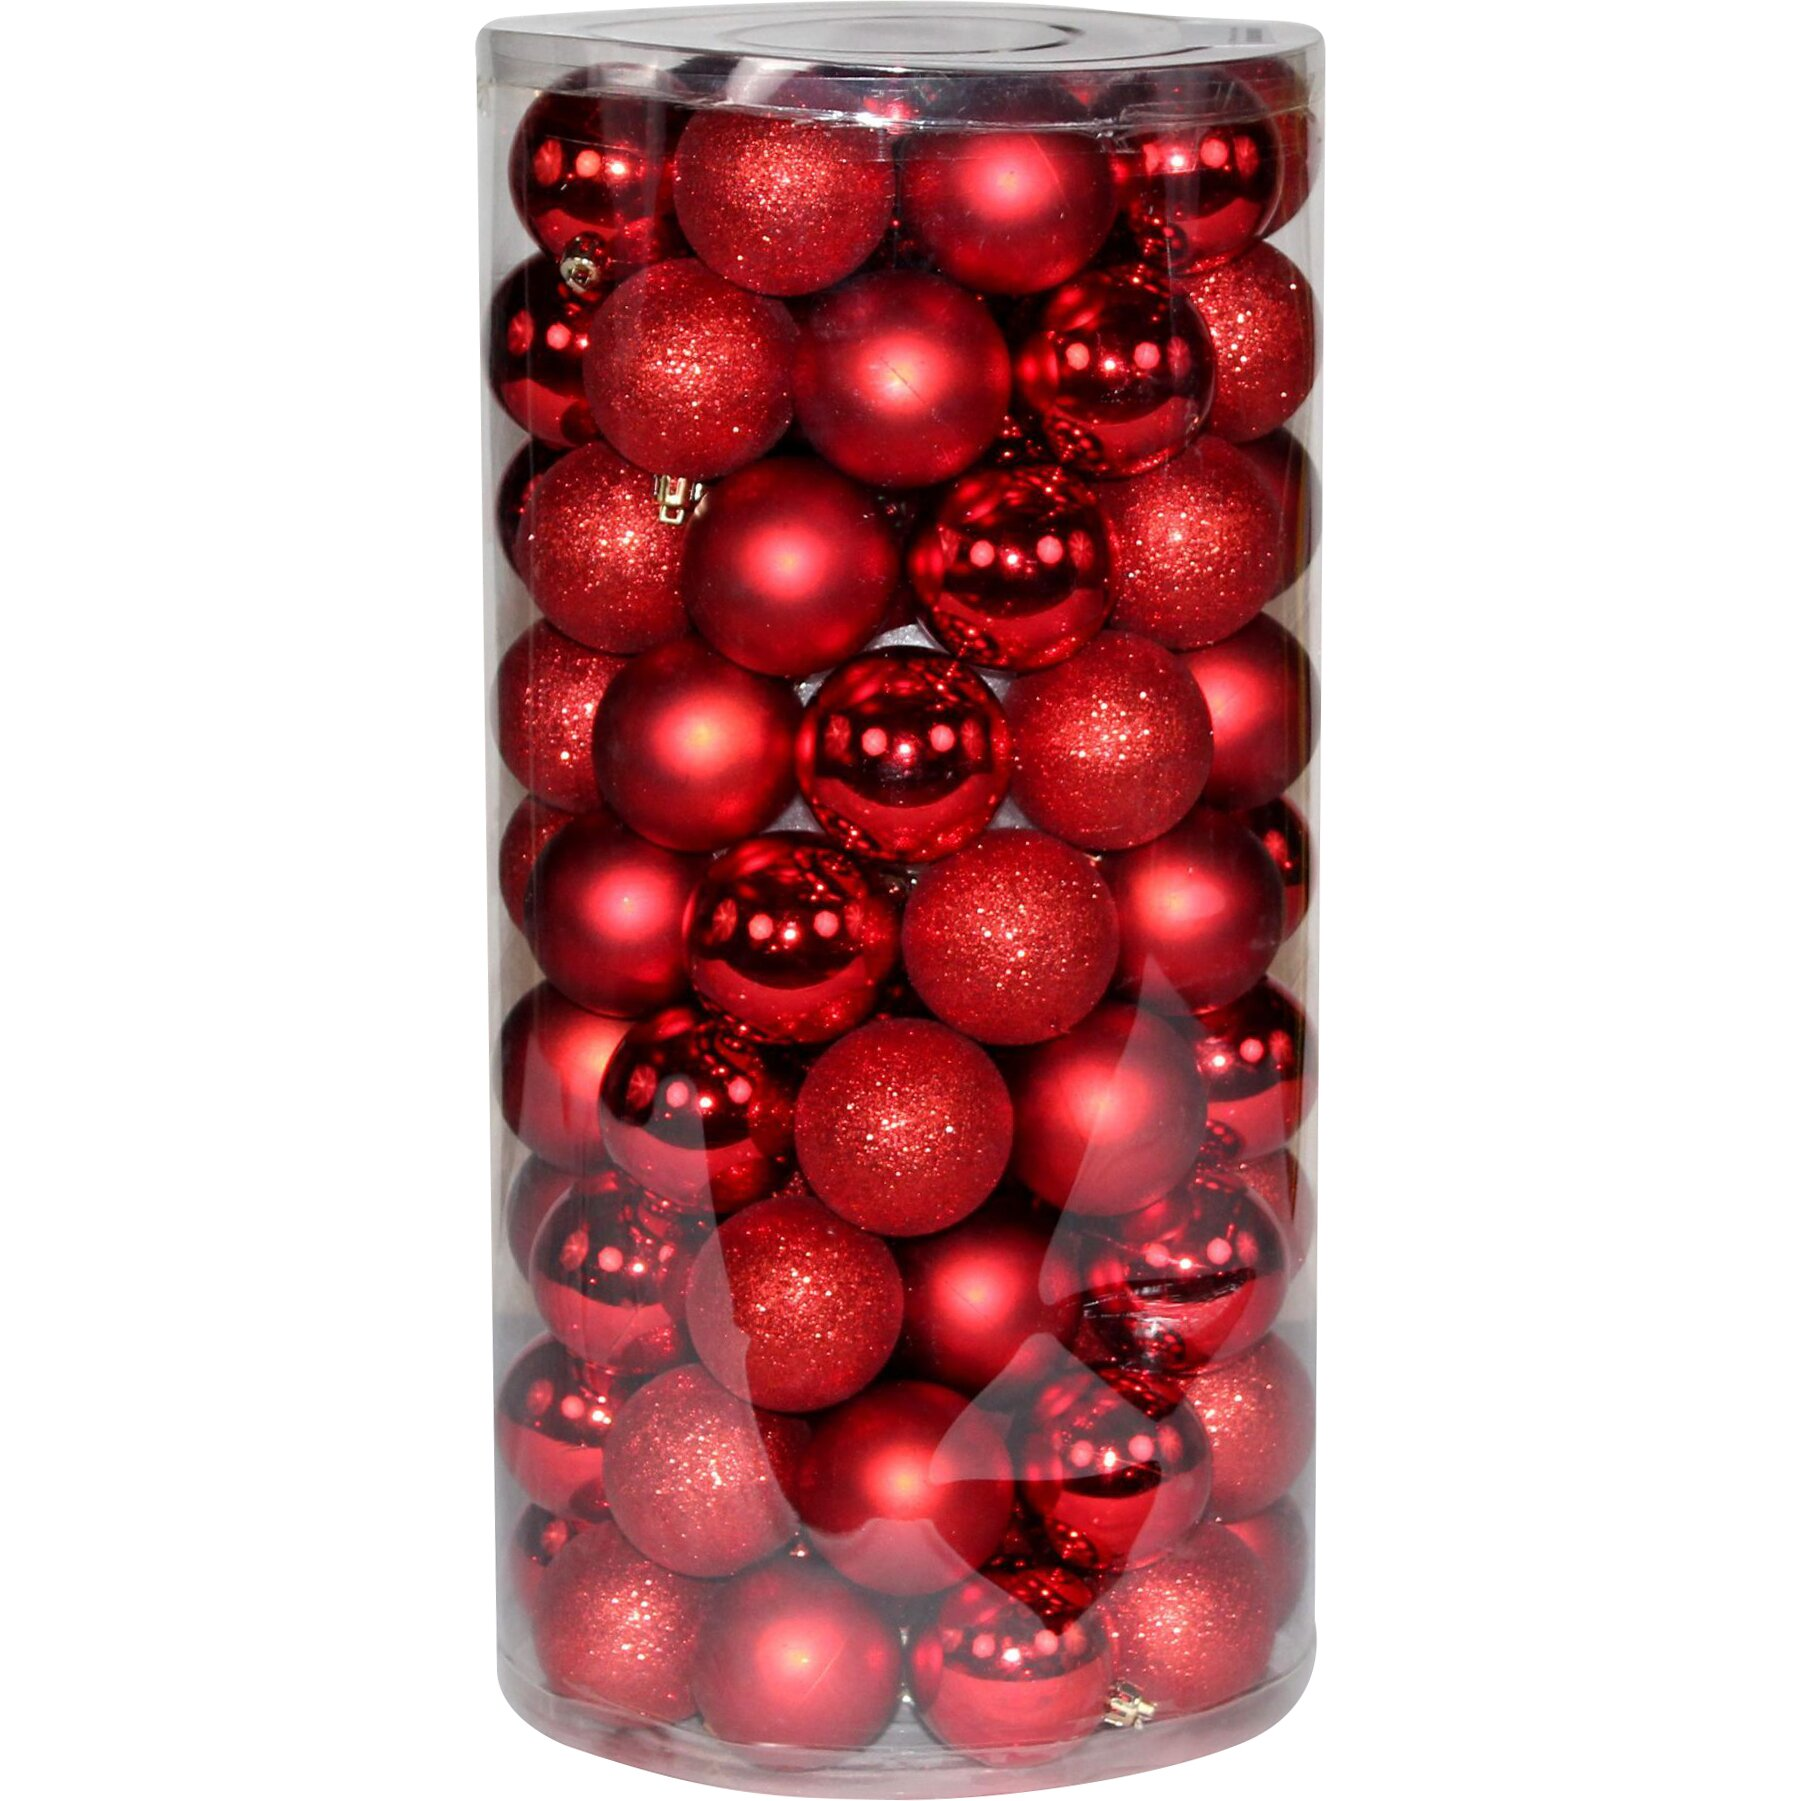 Plastic ornament - Ball Plastic Ornament